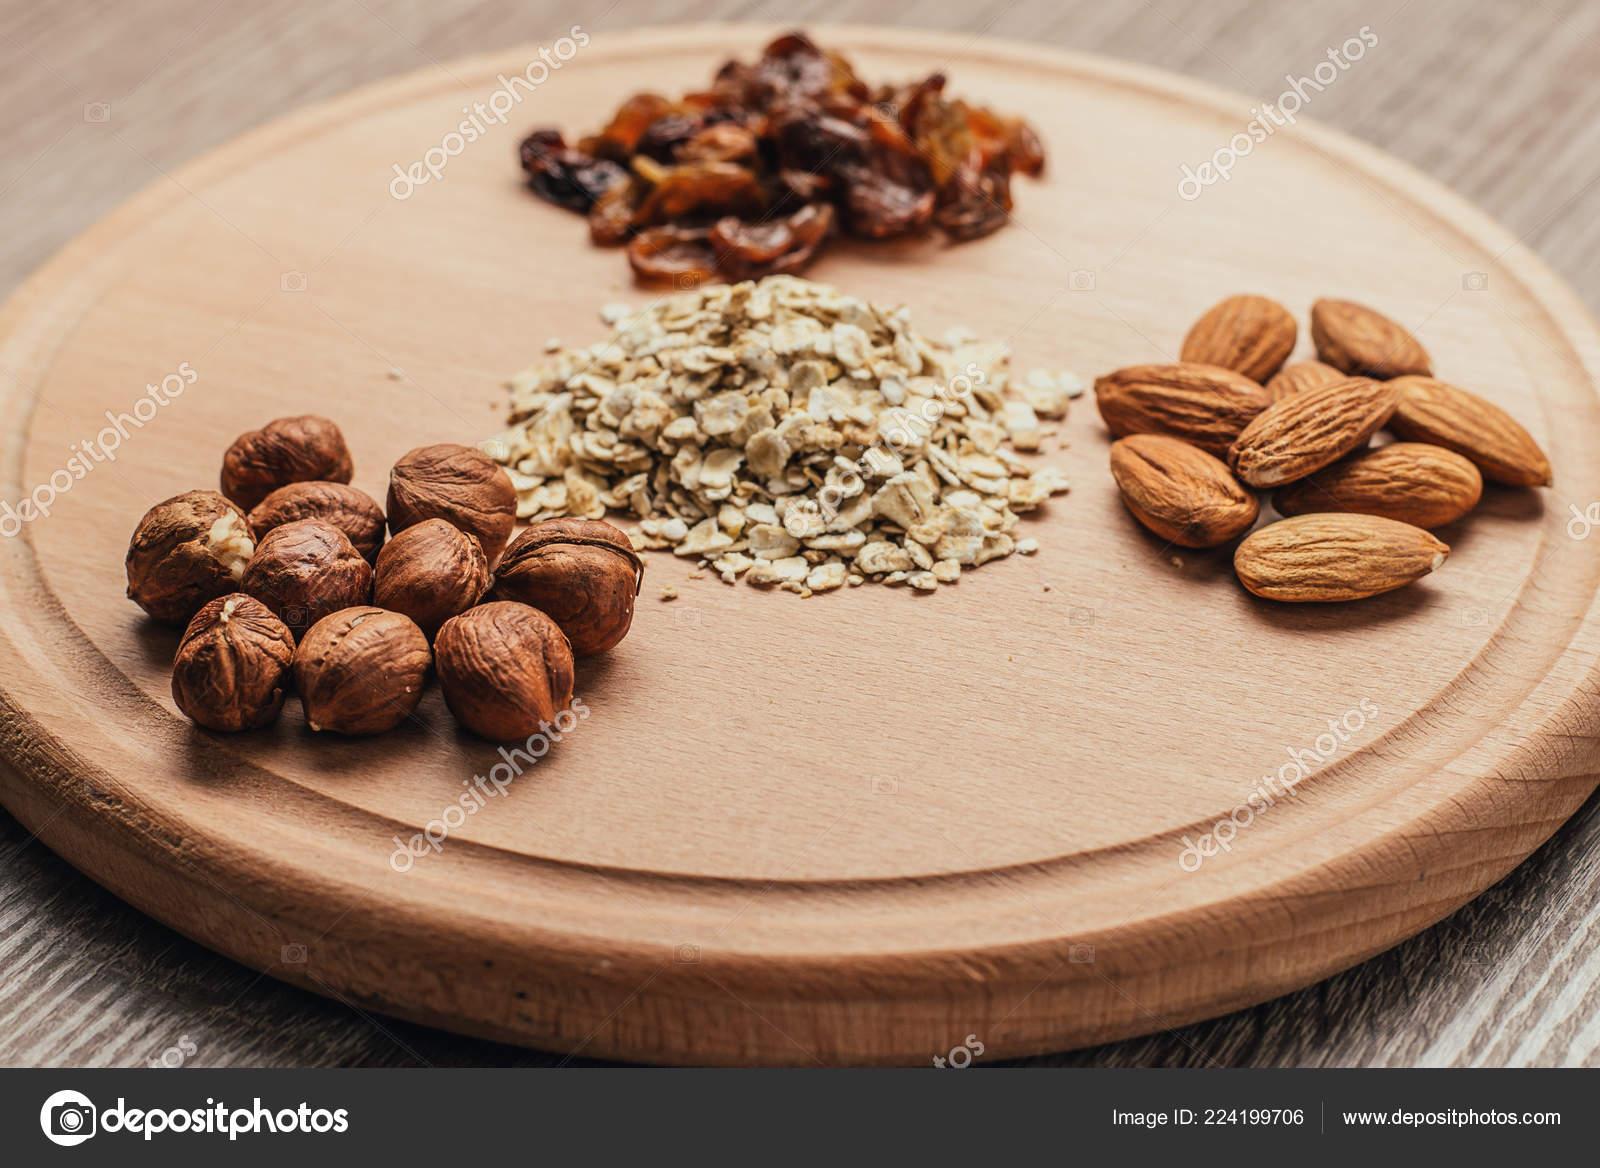 dieta con noci e mandorle